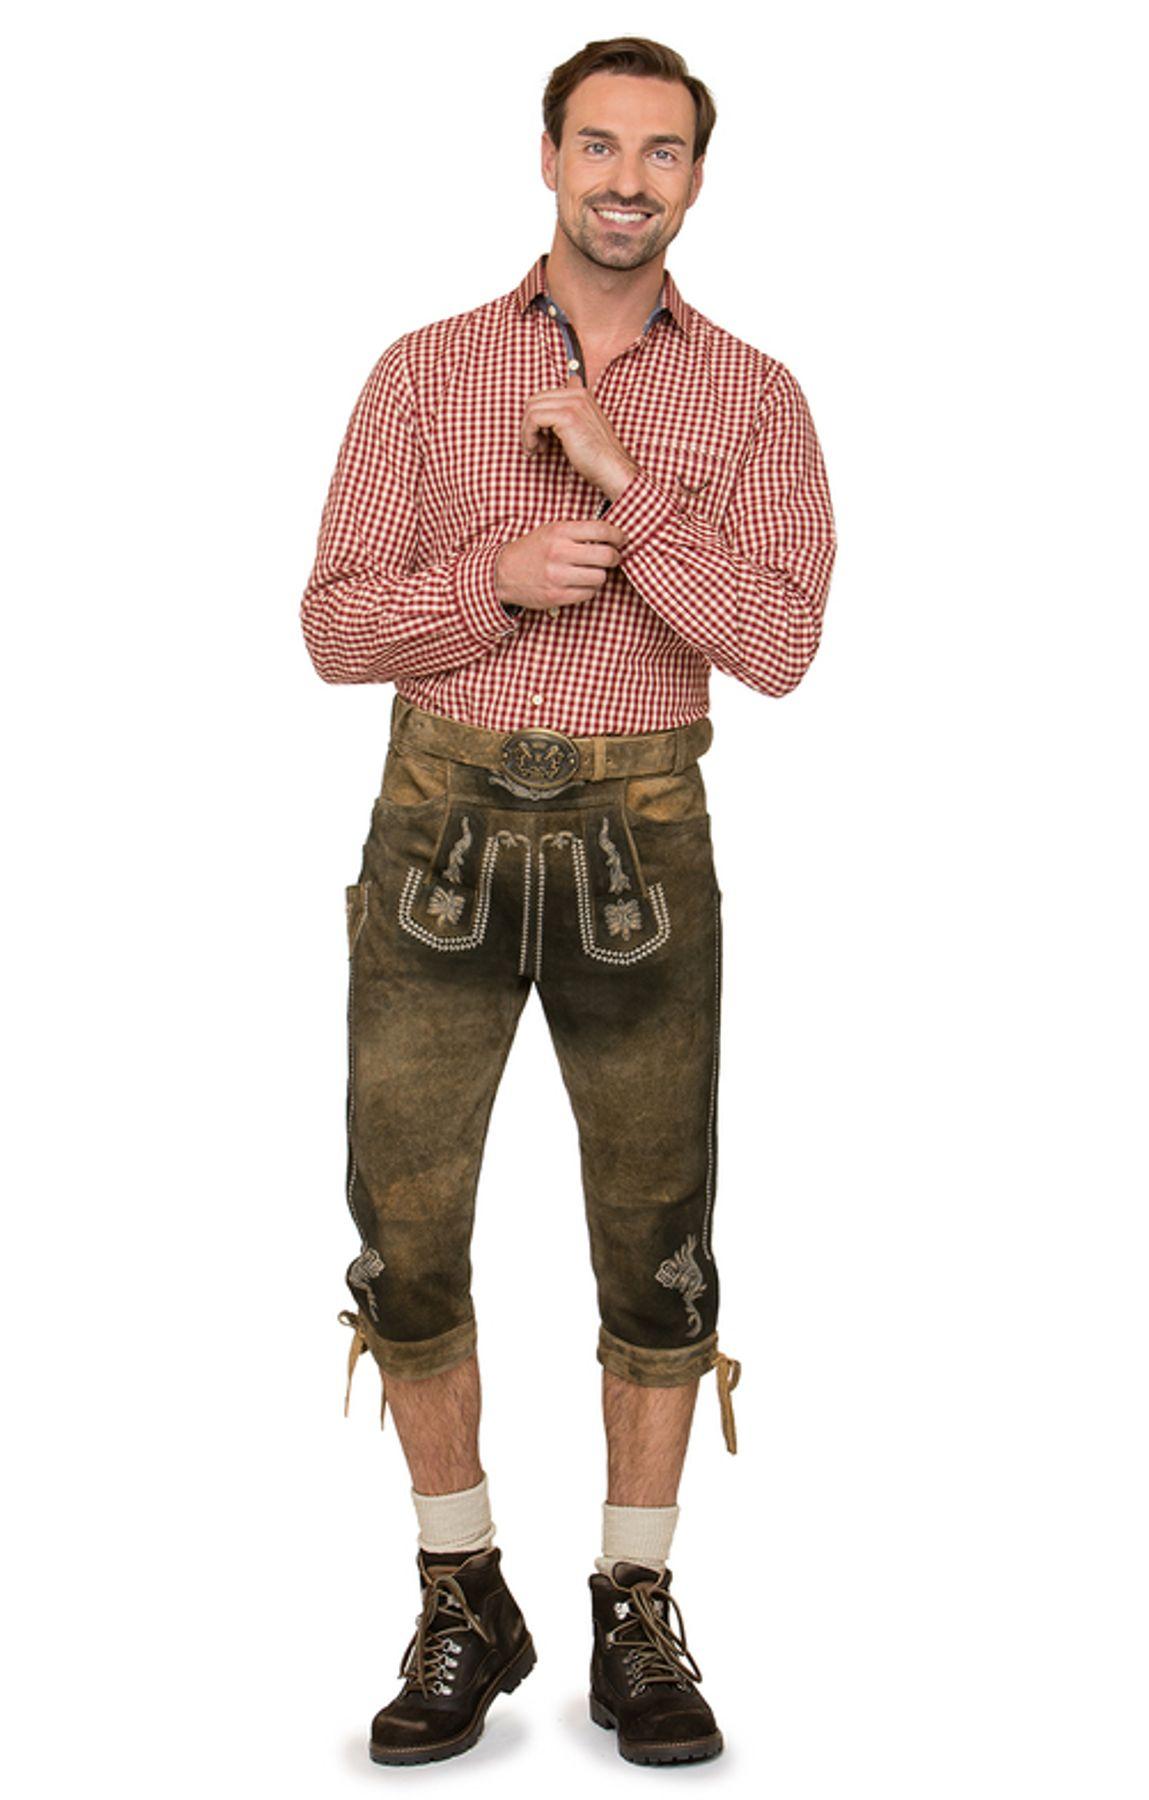 Stockerpoint - Herren Trachten Lederhose mit Gürtel, in uroid gespeckt, Sebastian – Bild 3